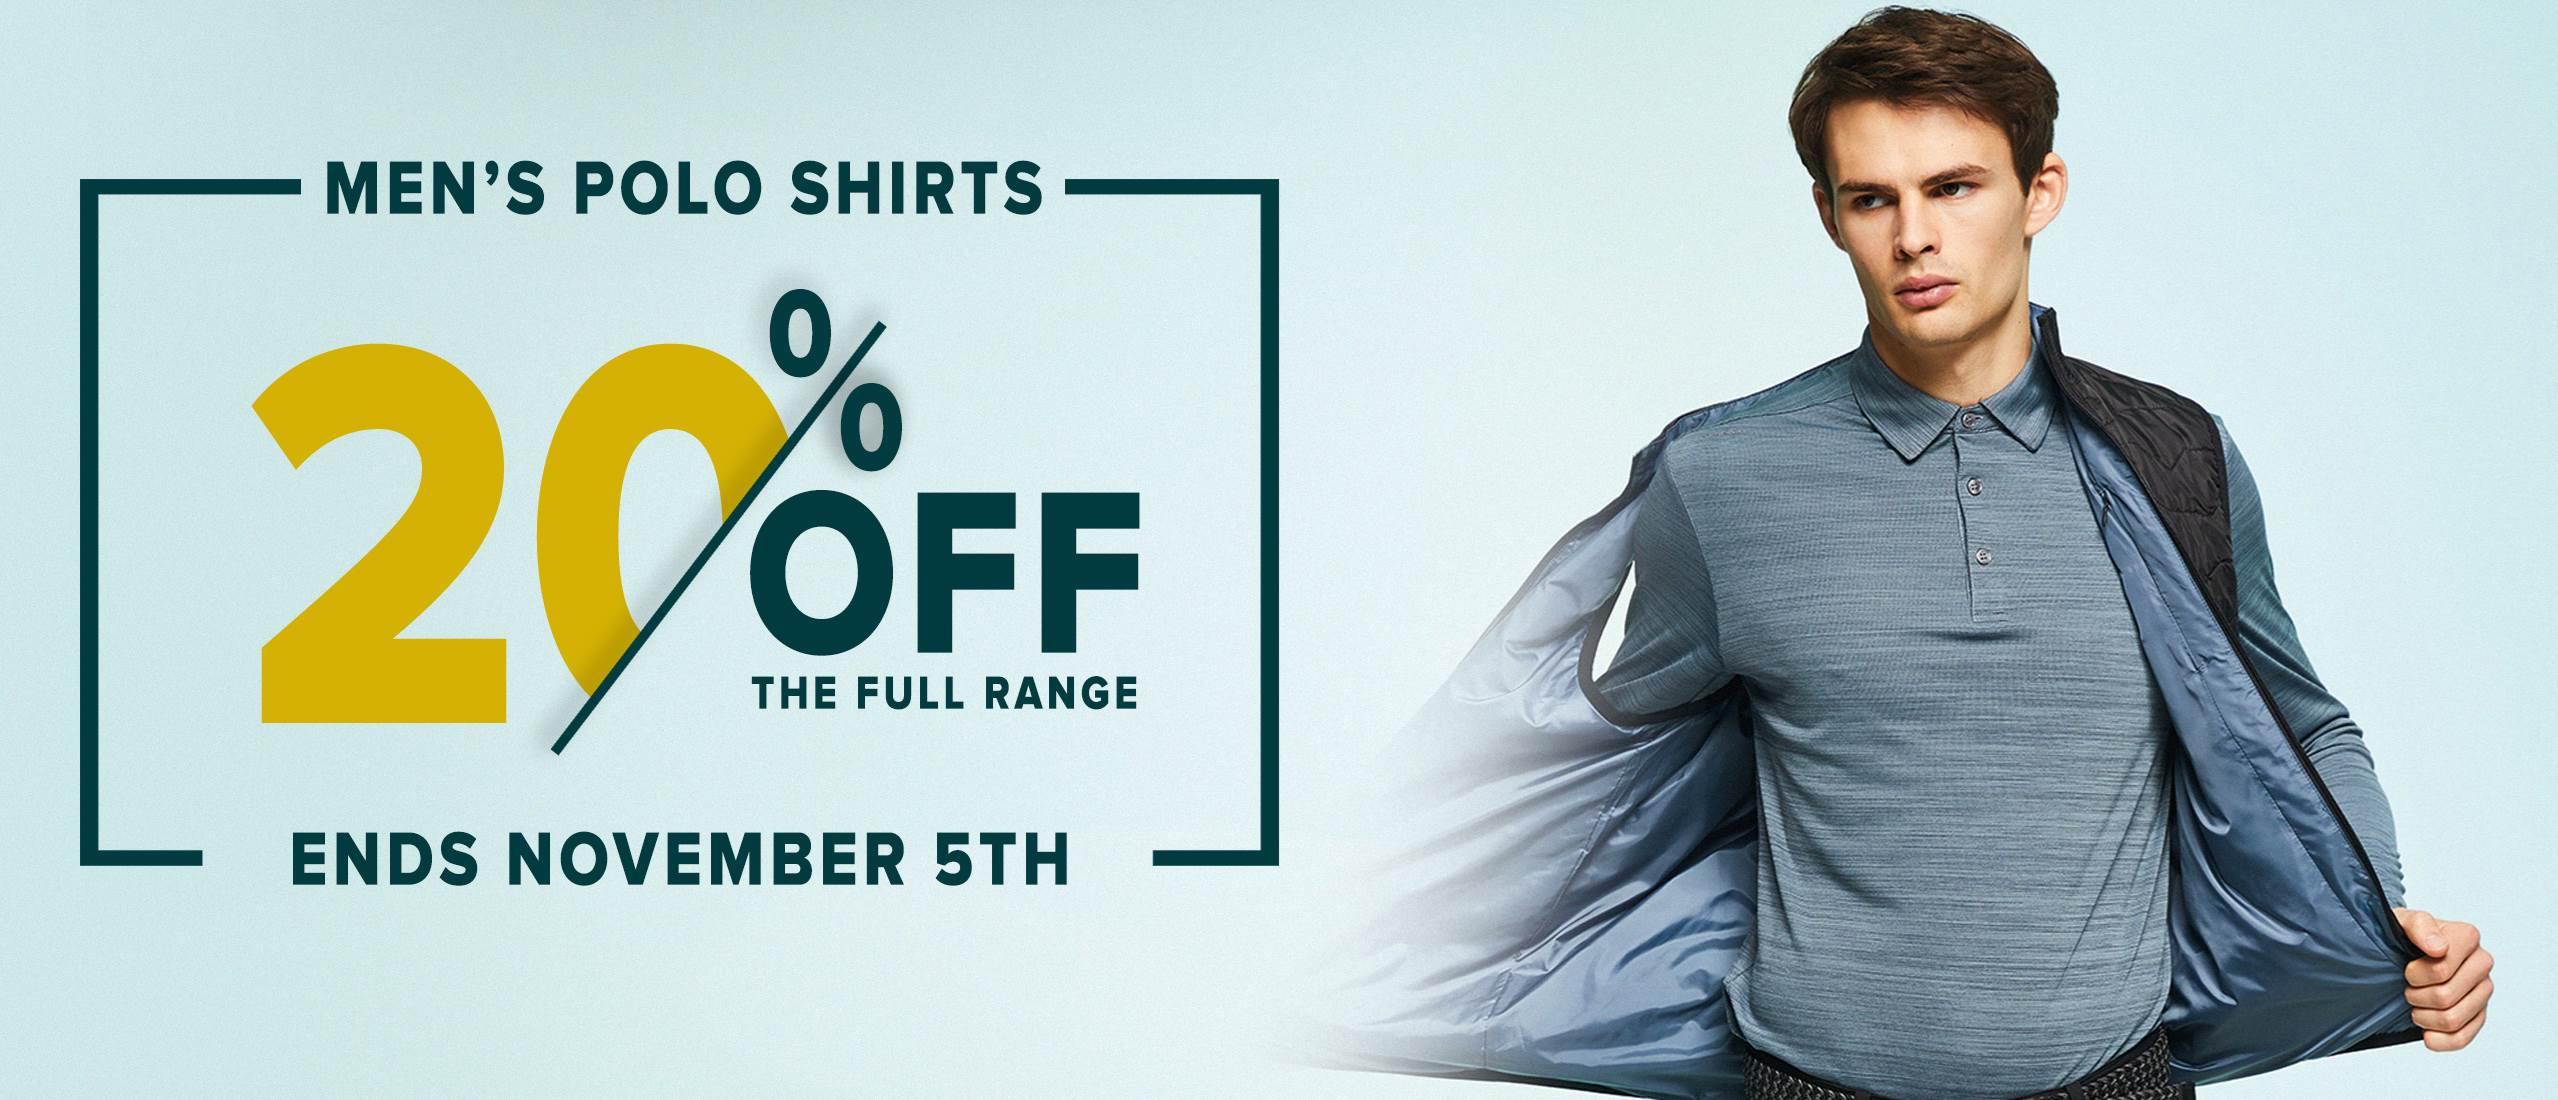 Mens Golf Polo Shirts sale